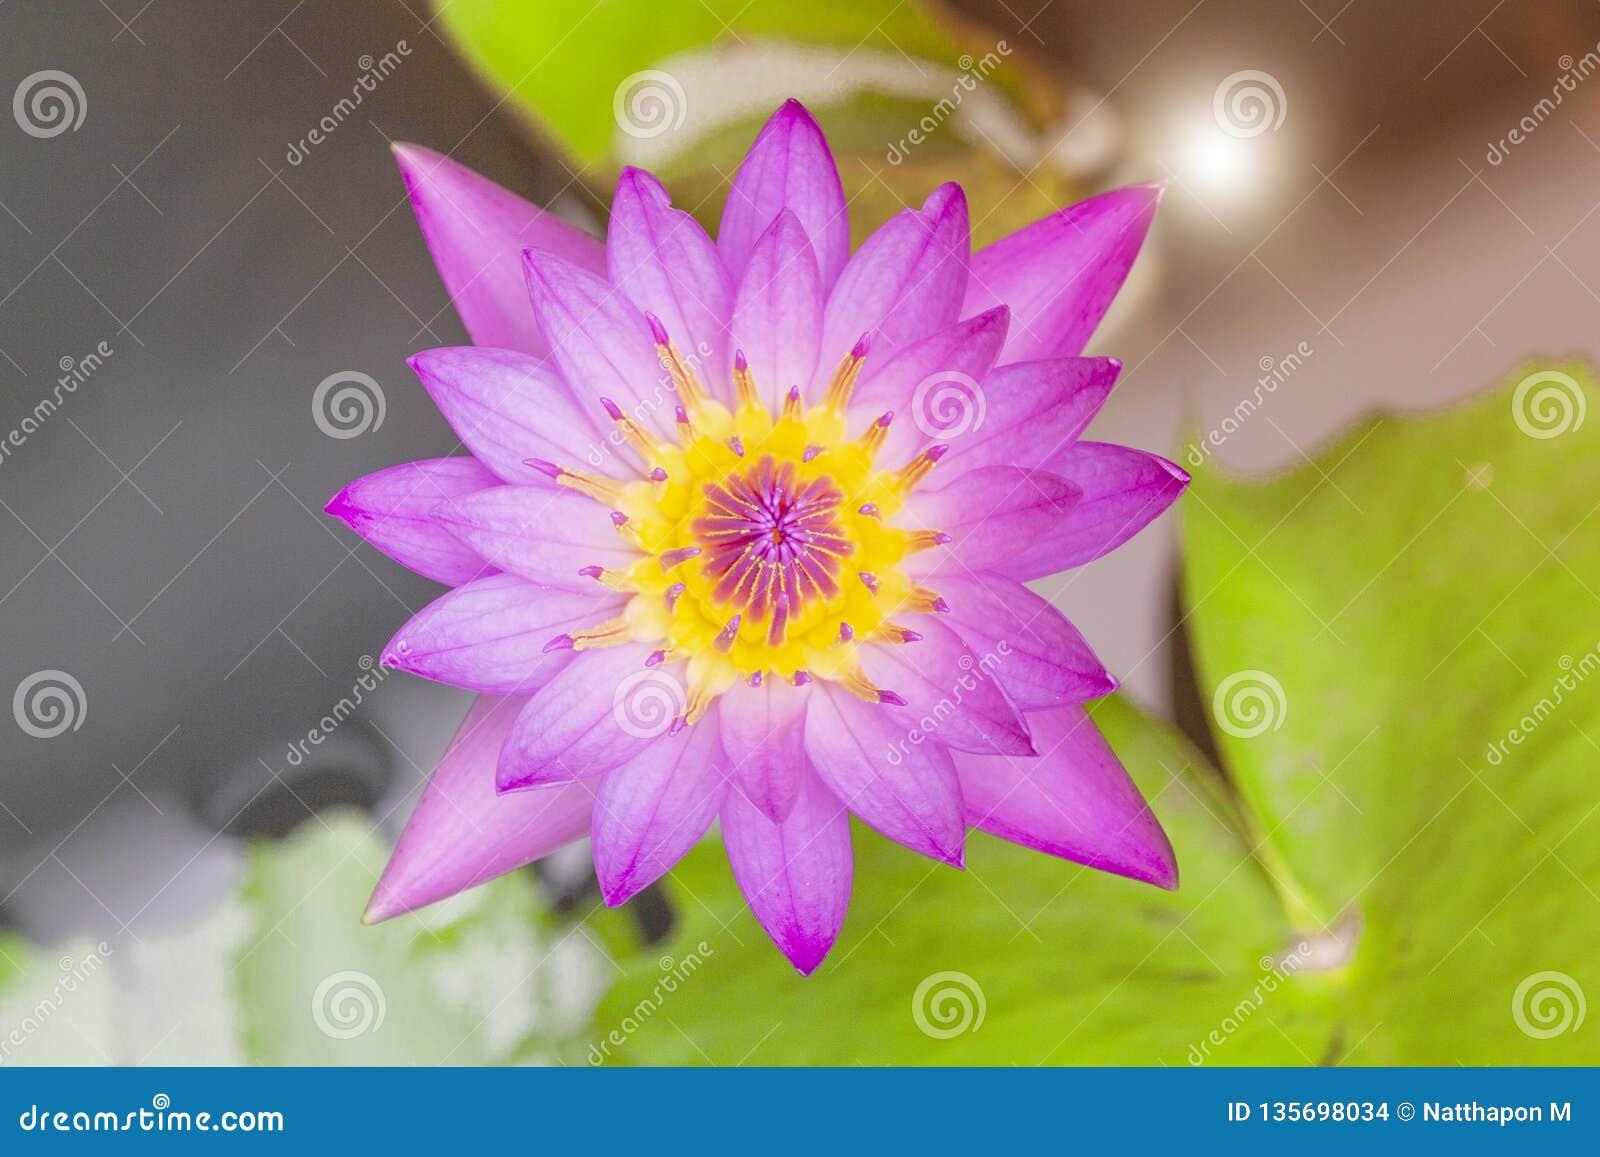 Flor De Lotus Vista De Cima